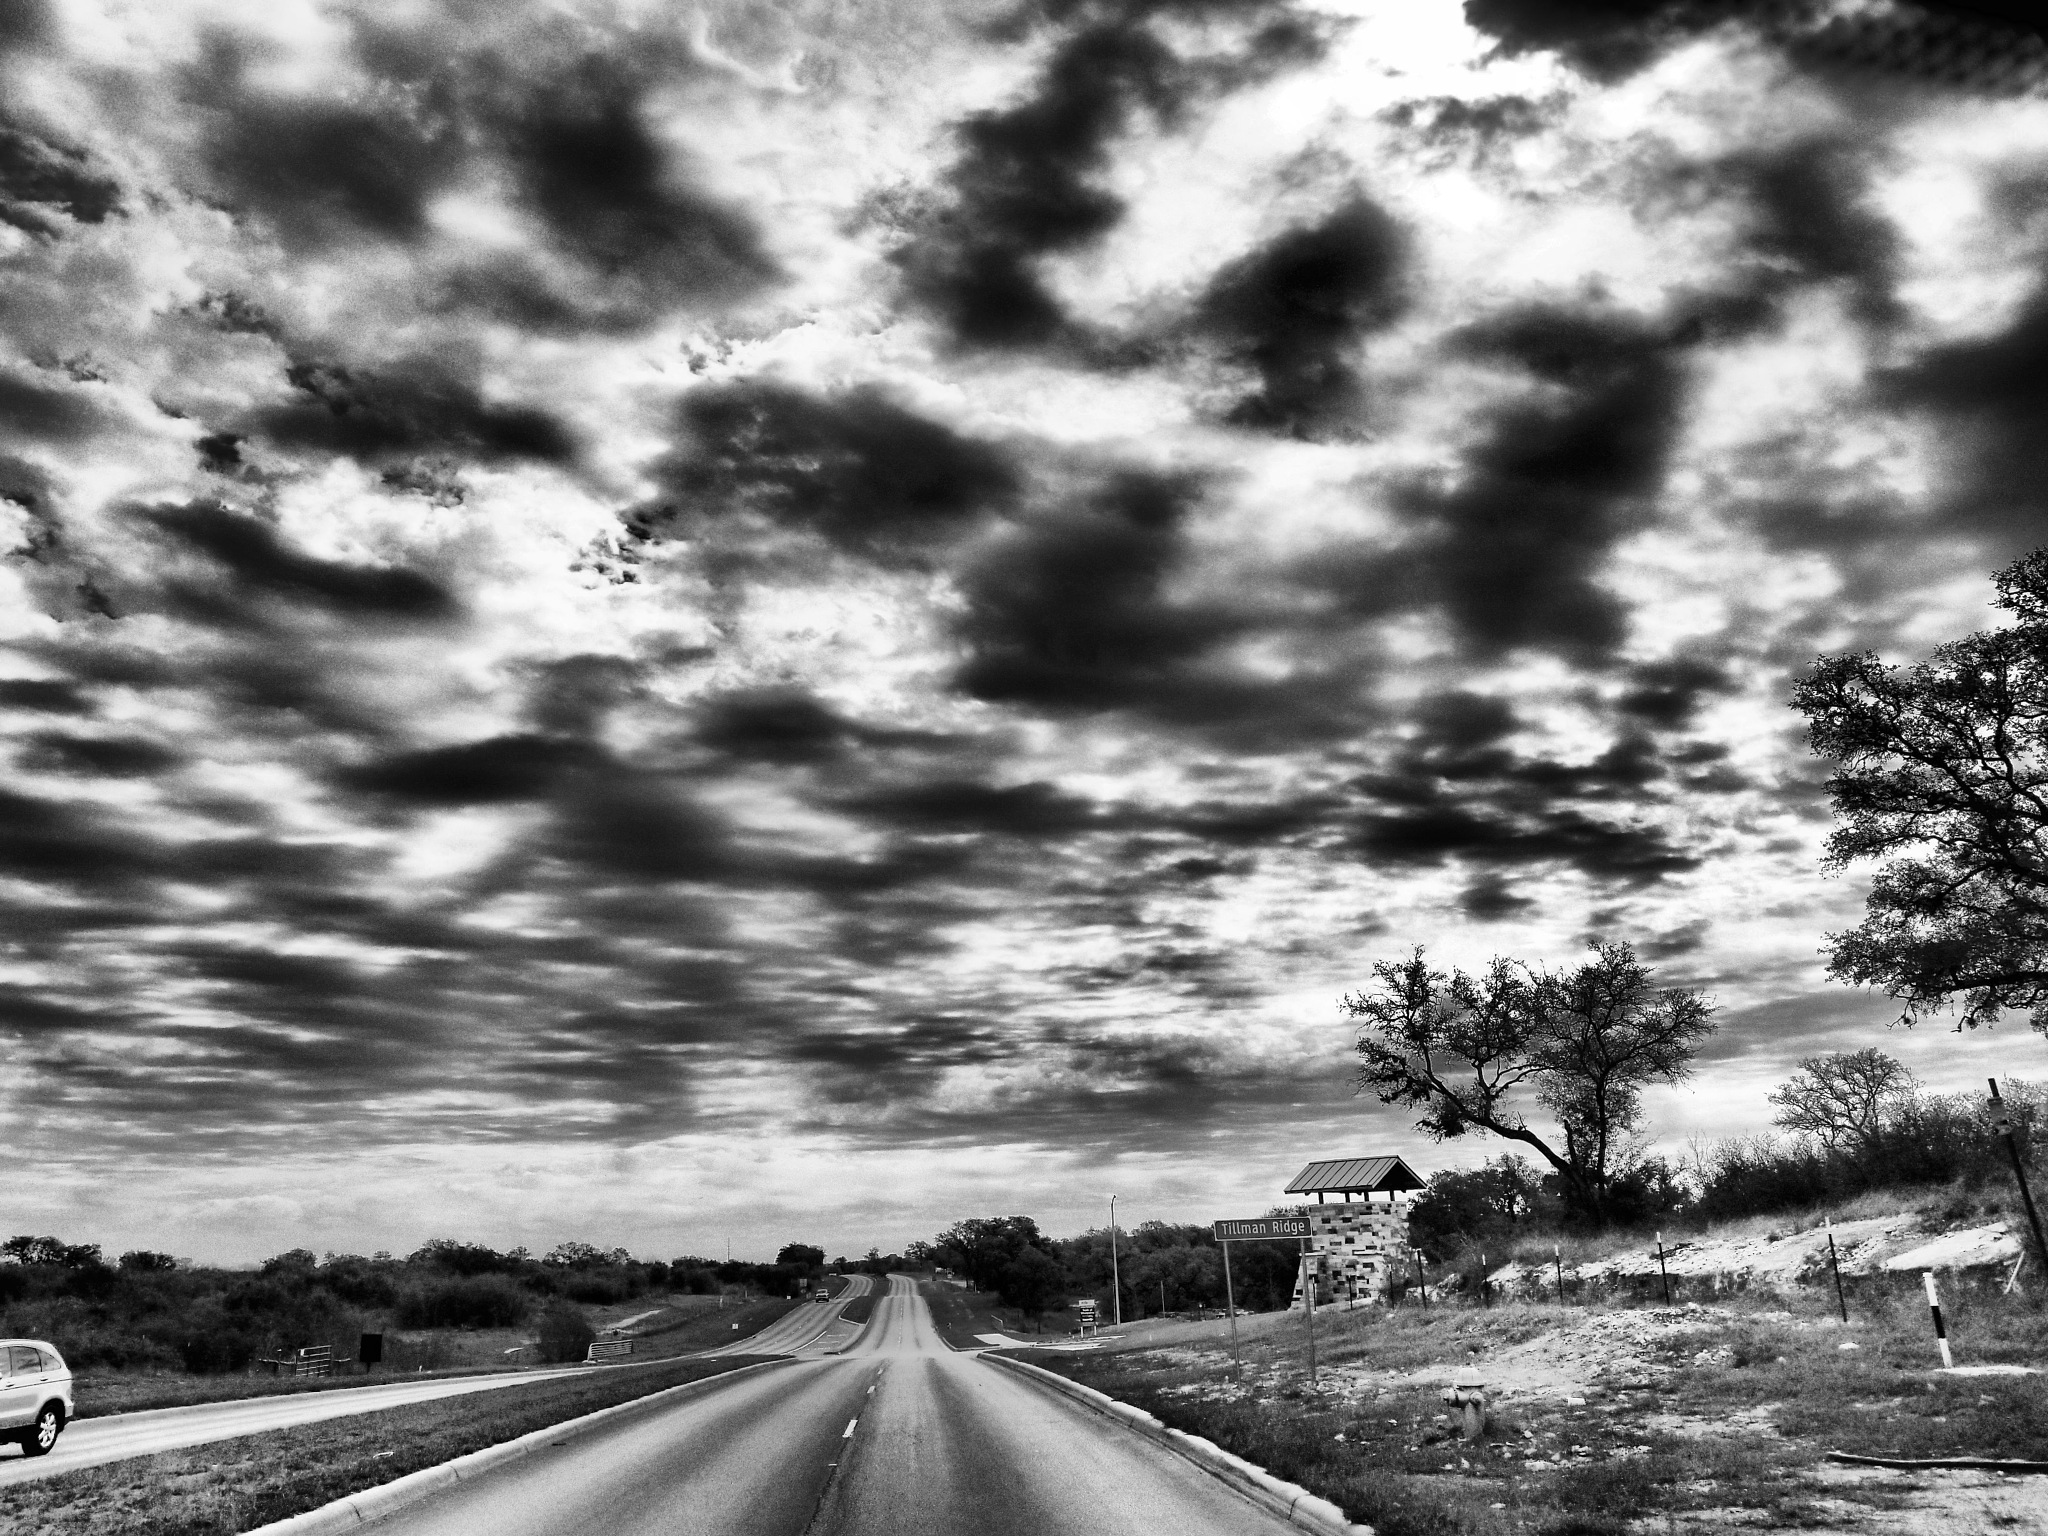 cloudy ridge by jwitherwax